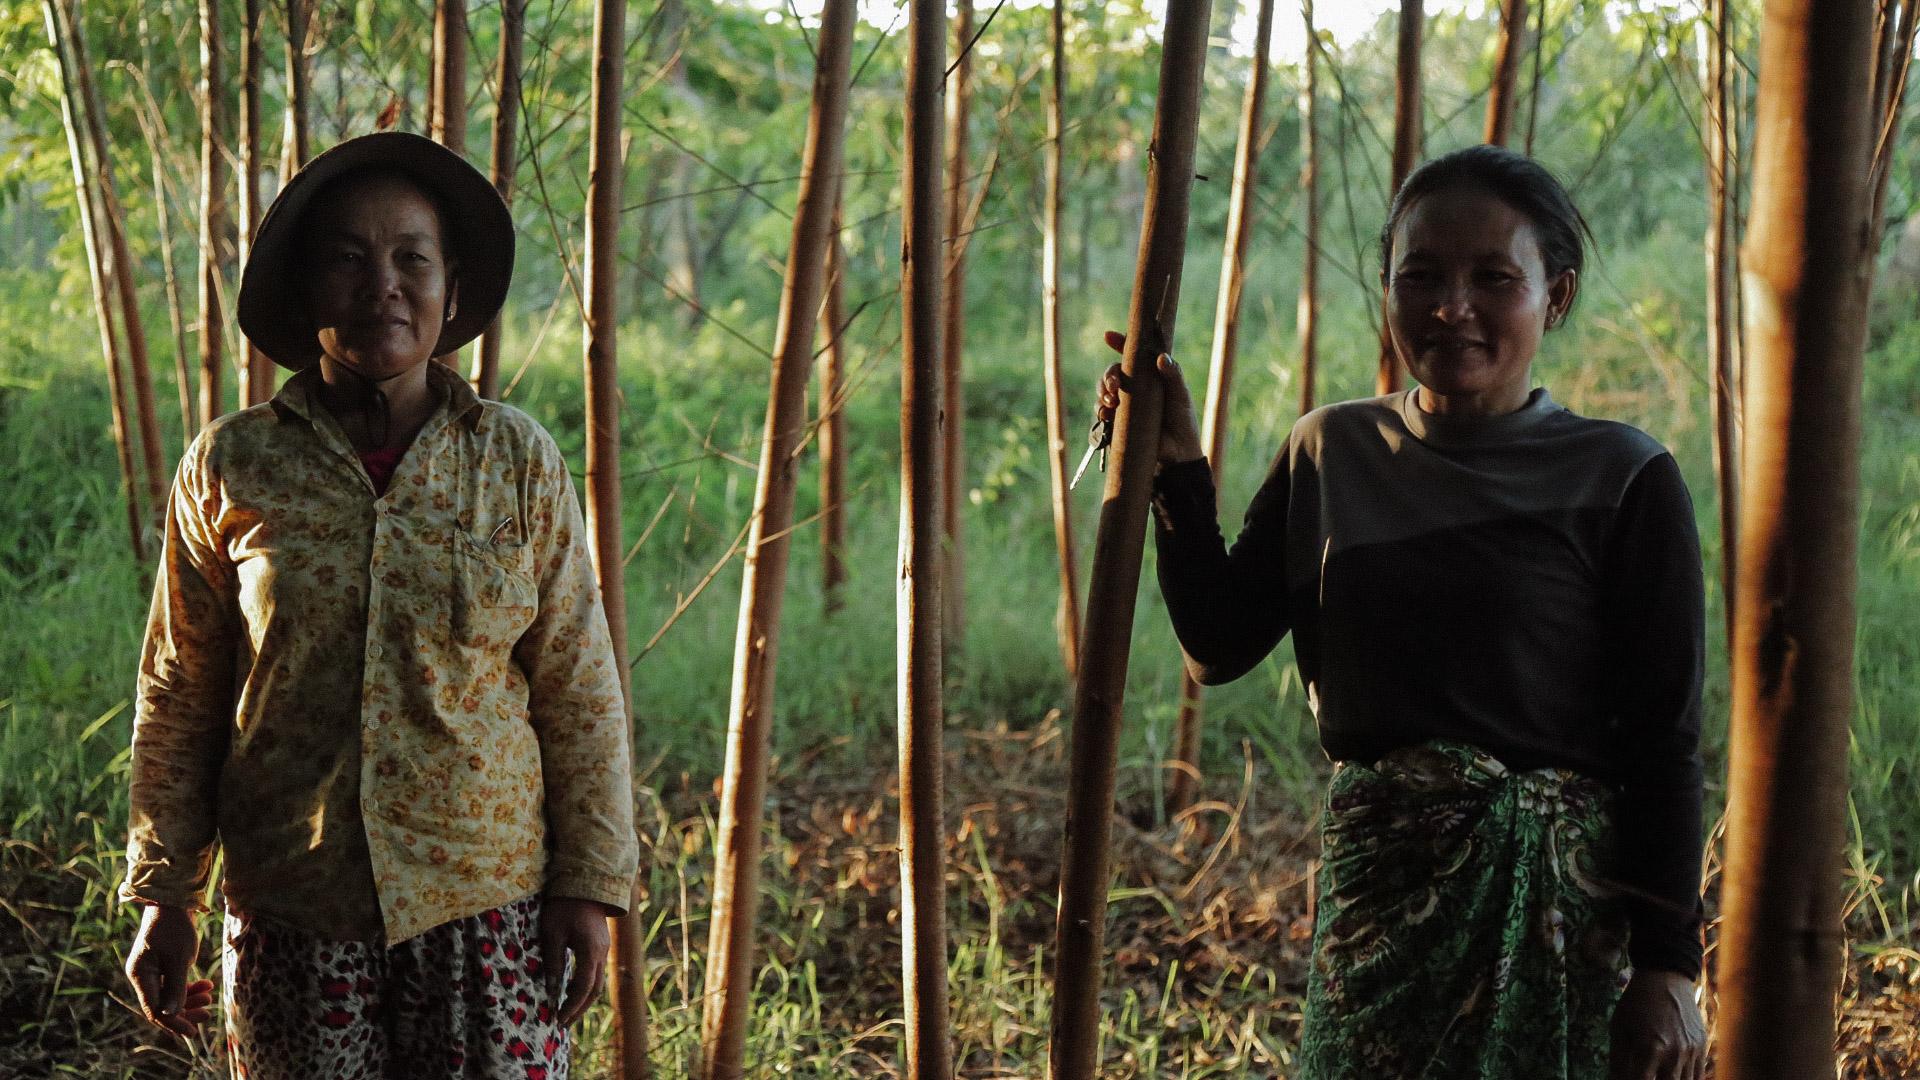 The Learning Institute_BakAmrek_Battambang_Cambodia_SEAFDEC 03